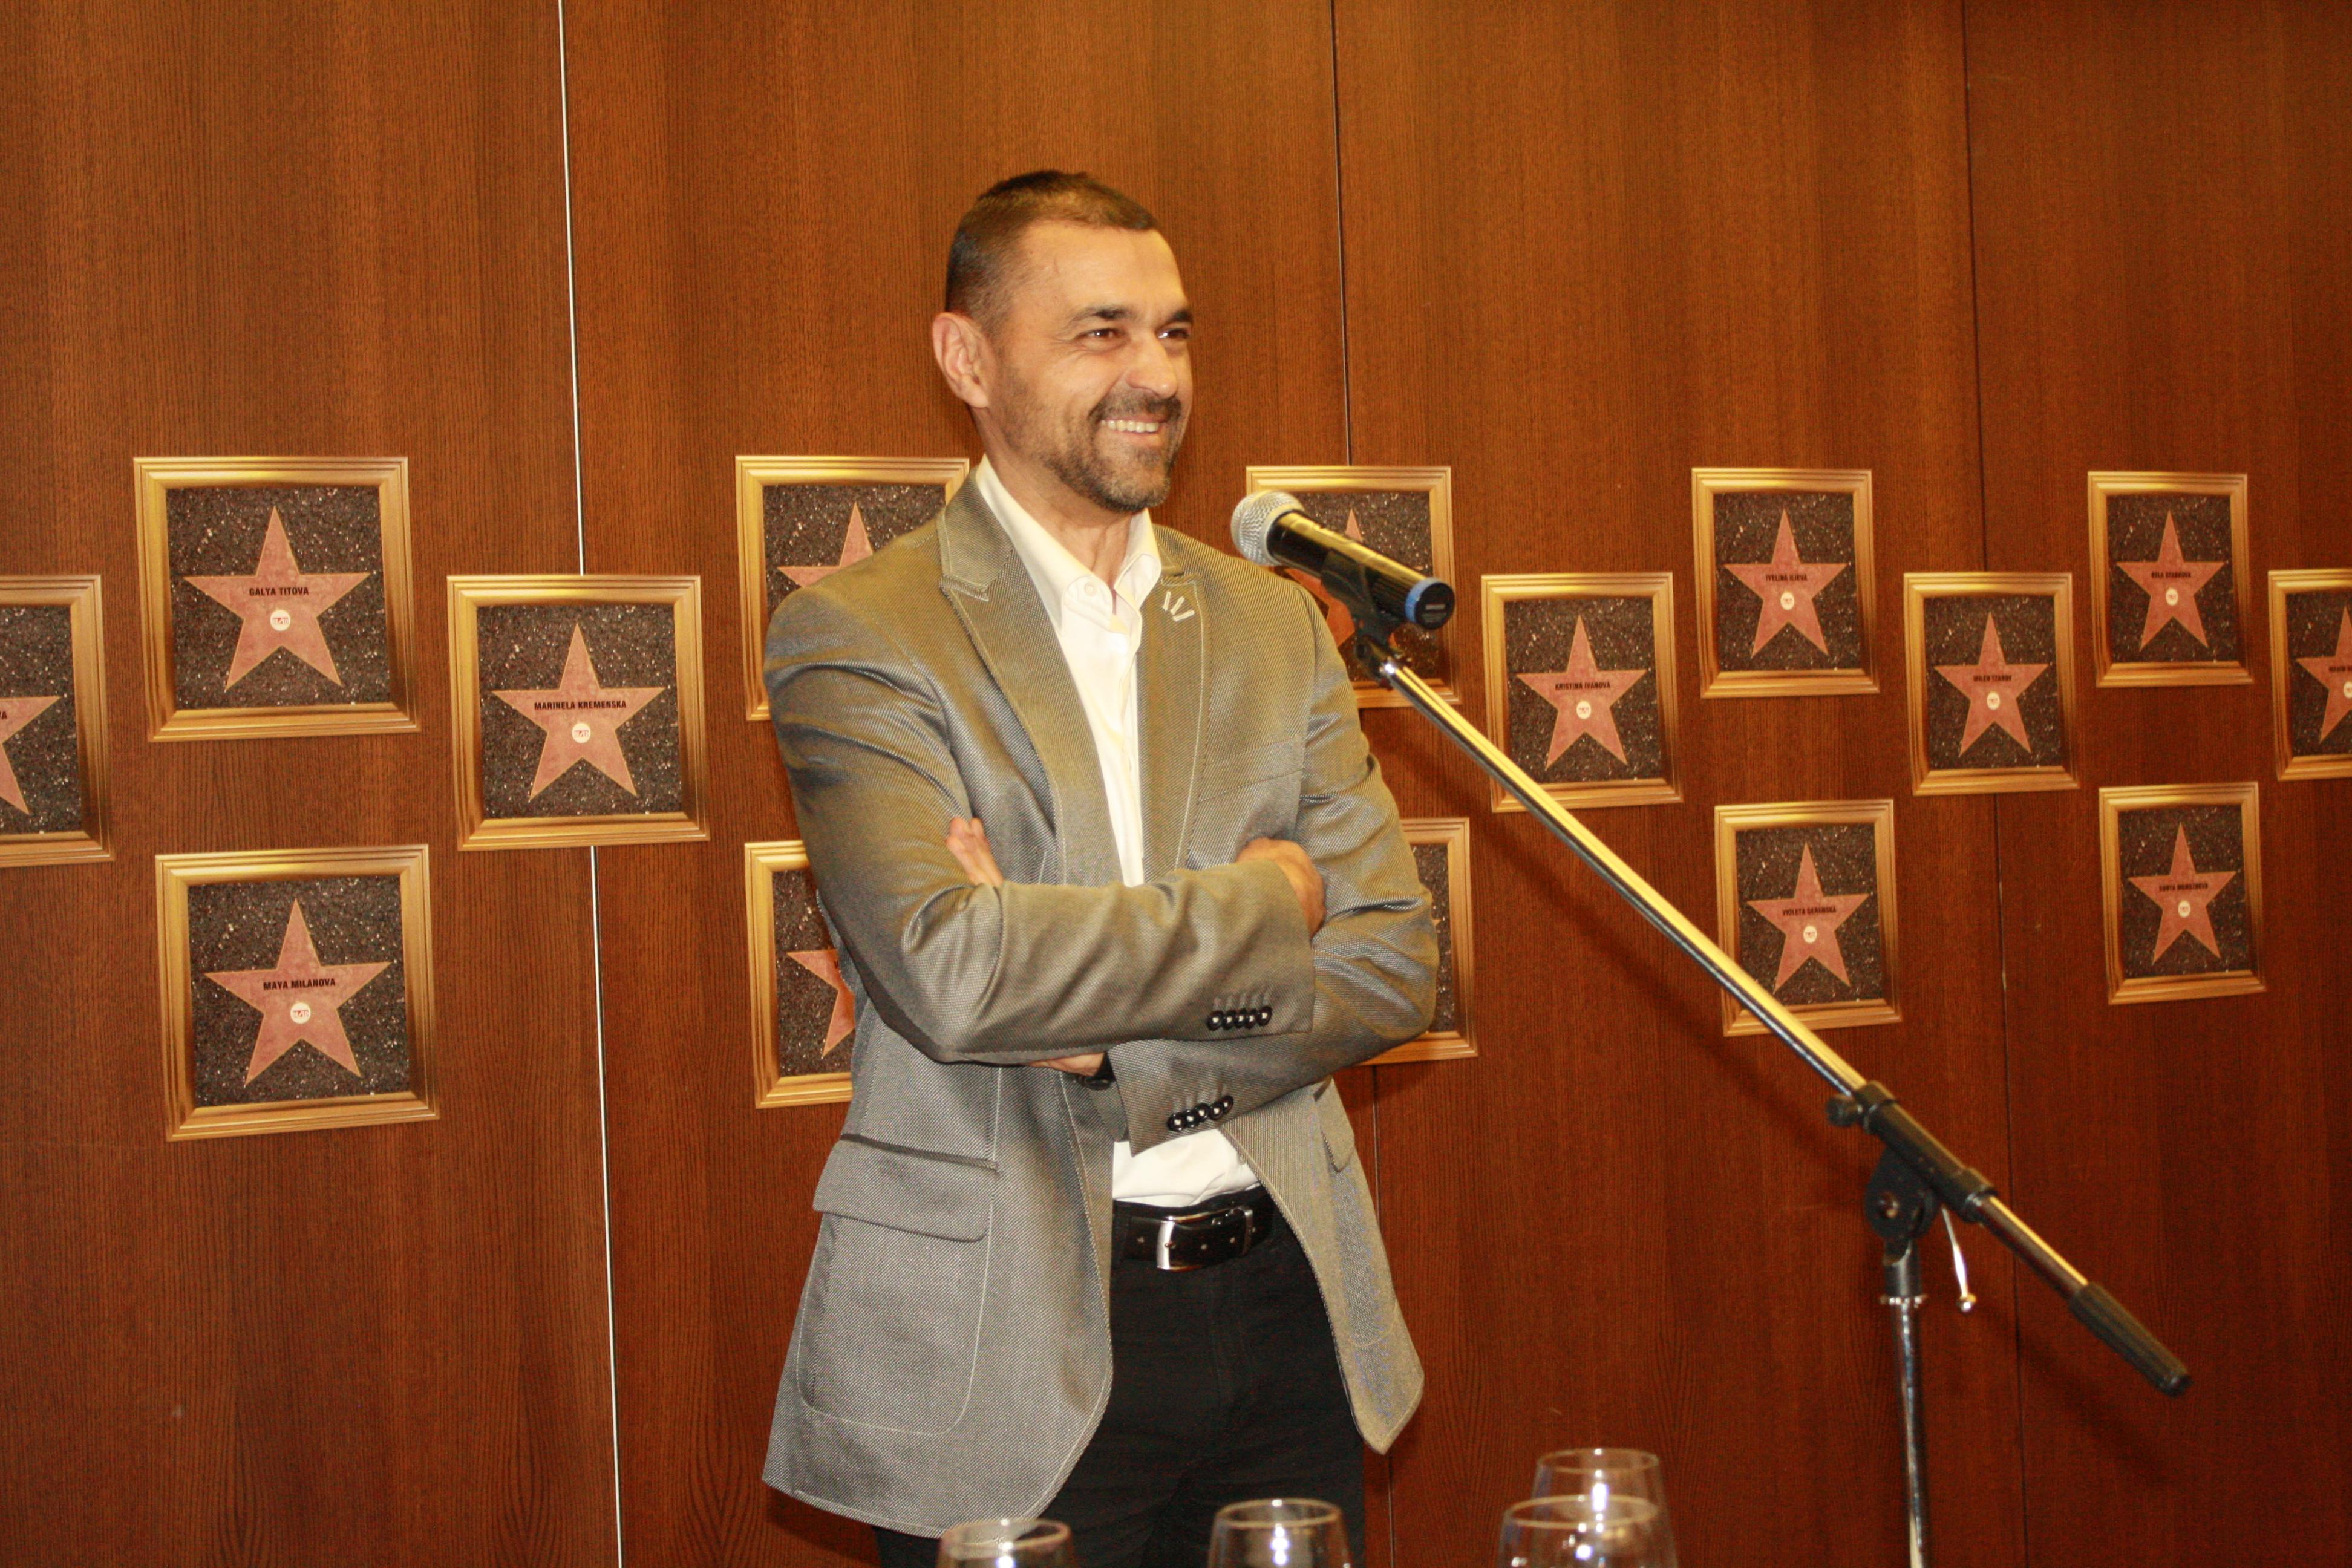 Ivailo Tomanov motivational words